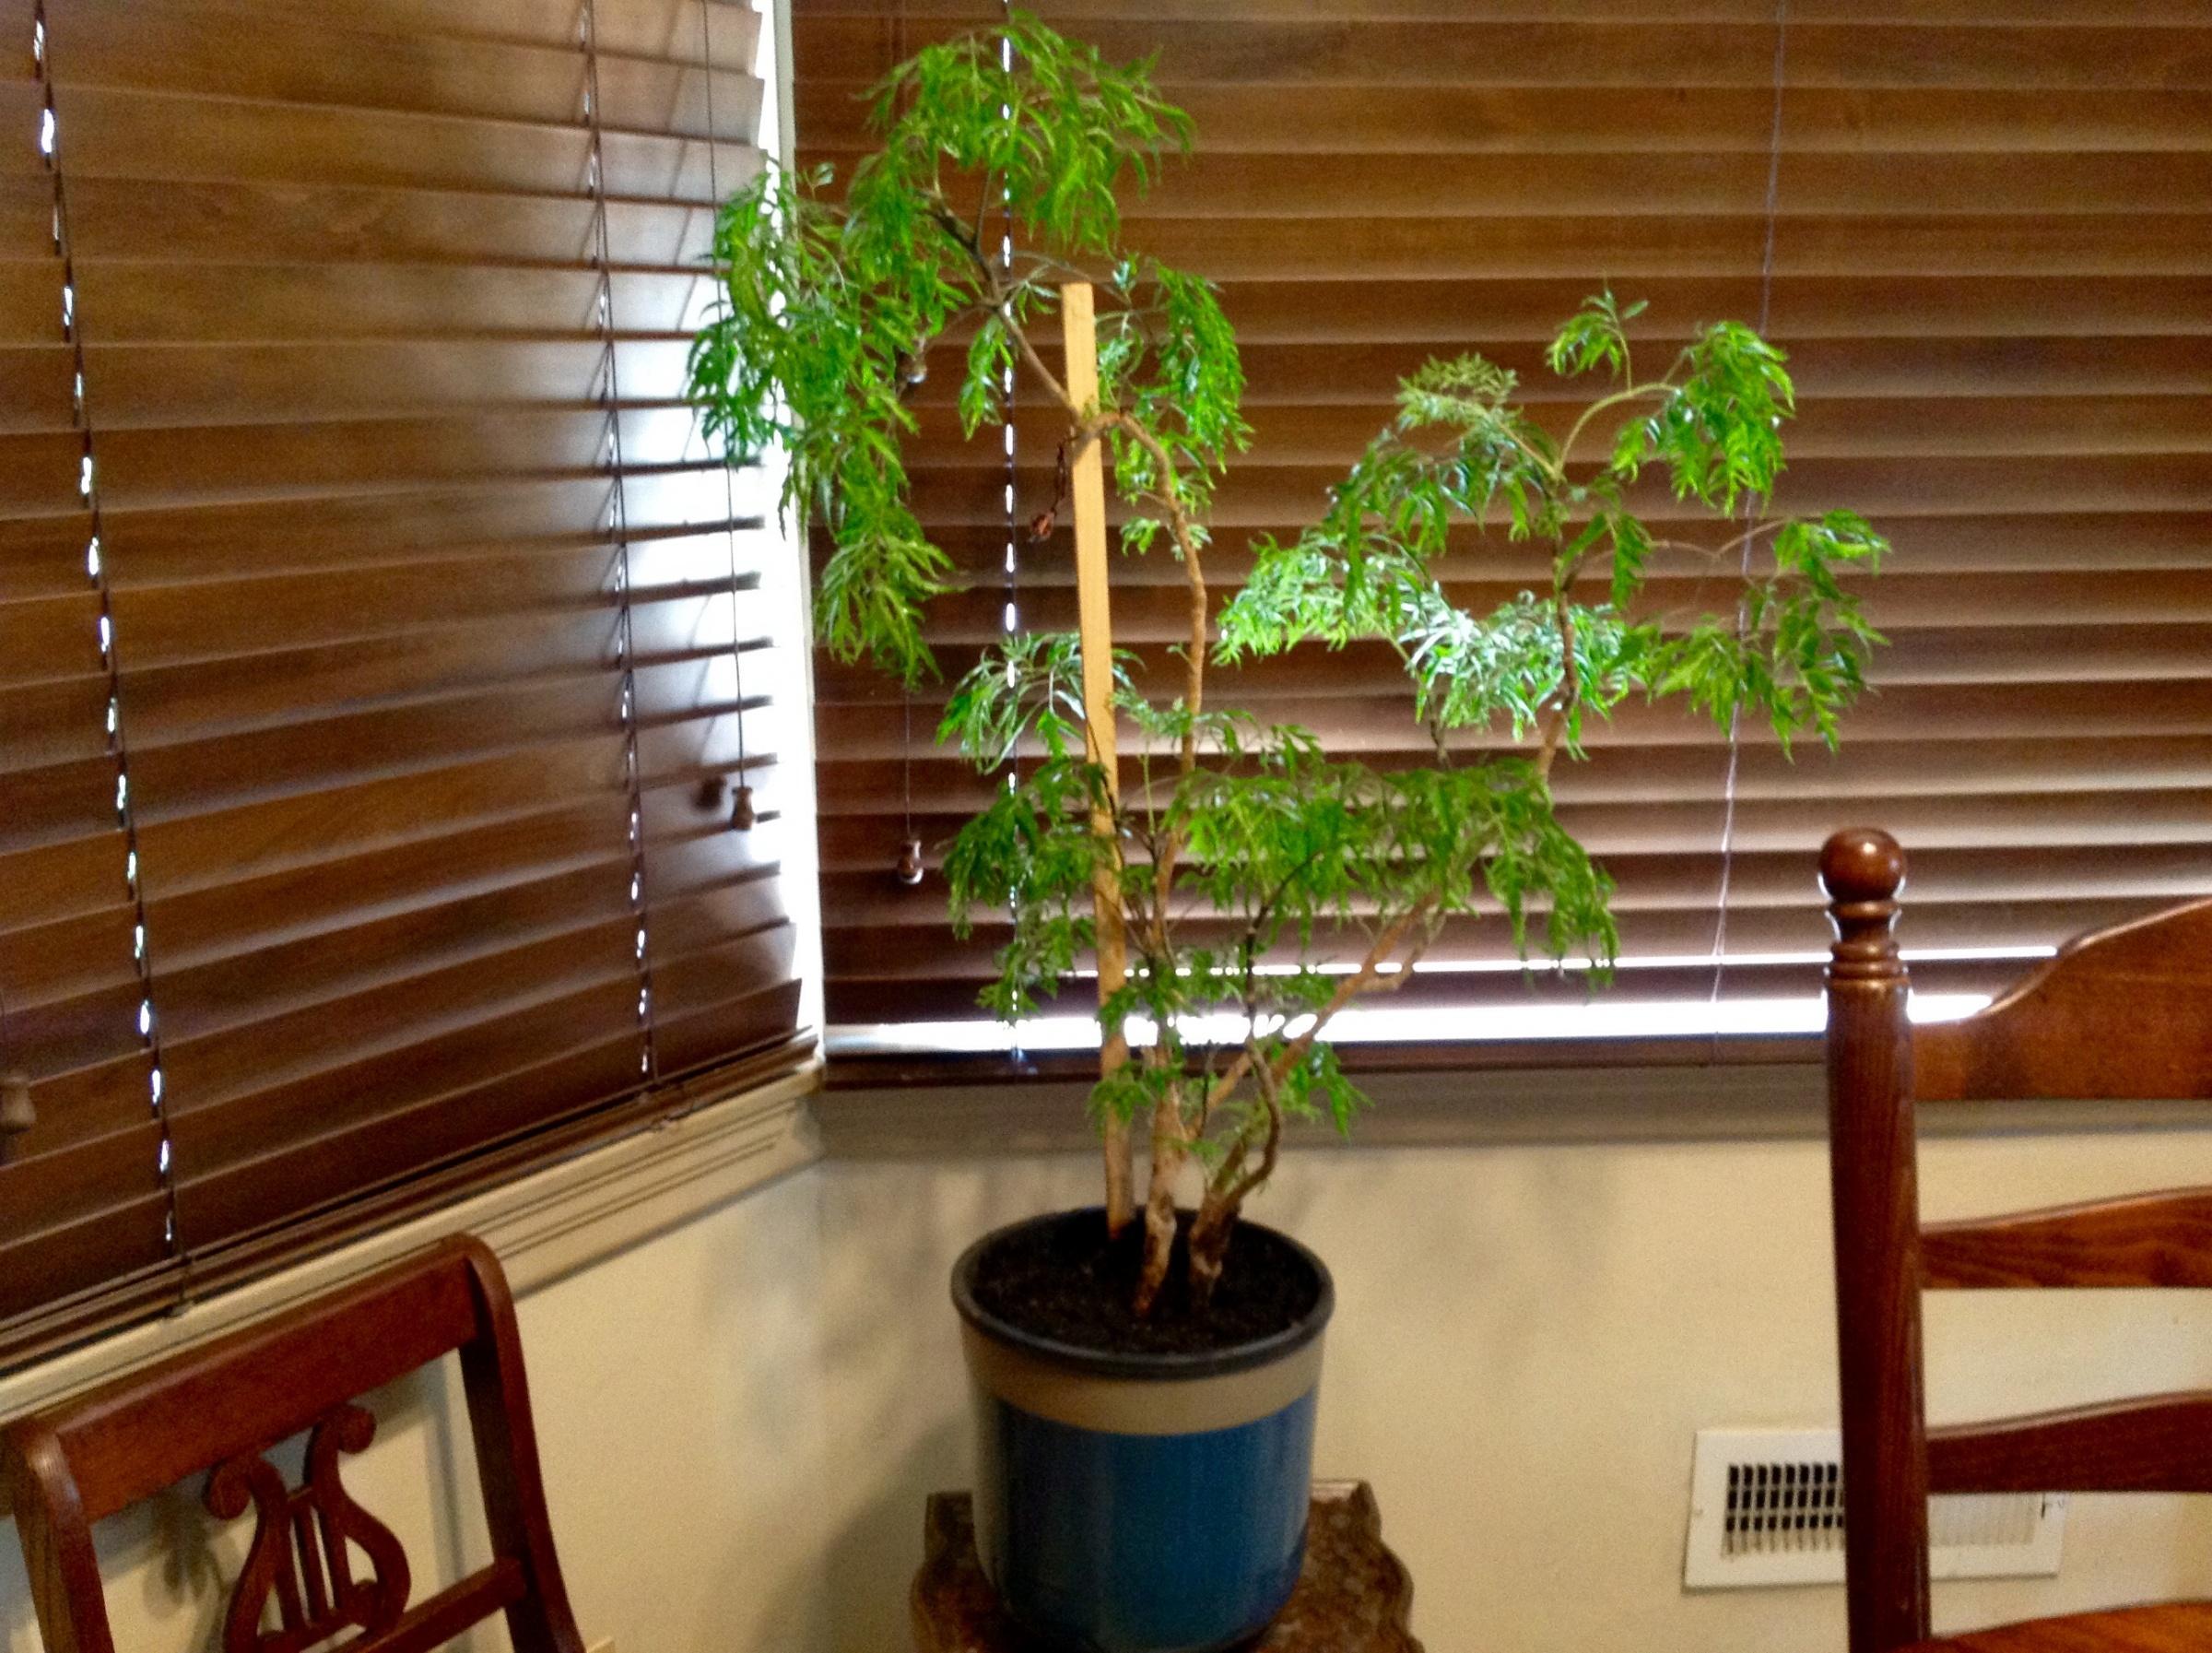 Lemon Tree update-225c478c-f445-4ff9-9753-ef5f1f9f01be.jpg